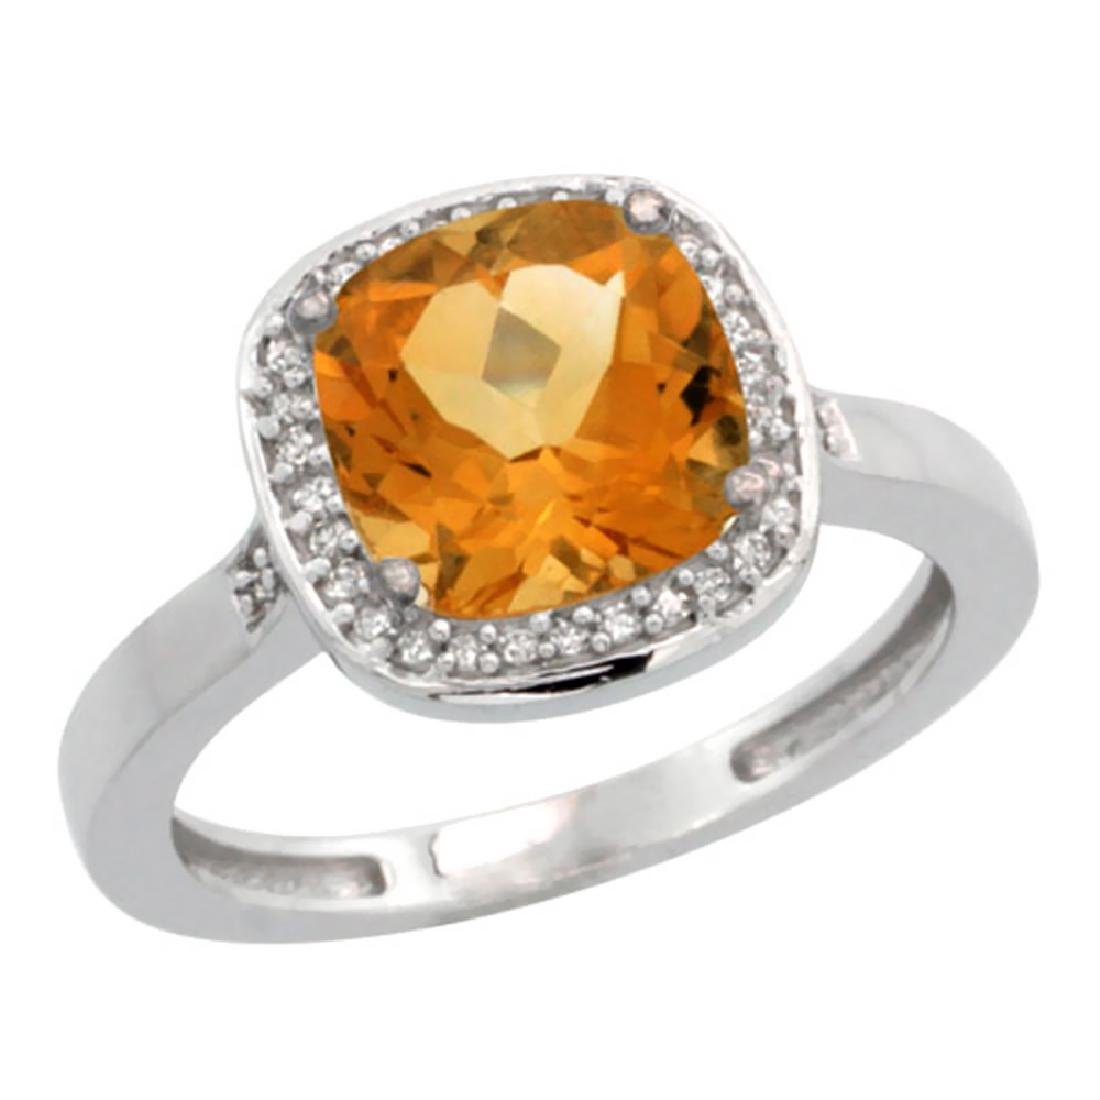 Natural 3.94 ctw Citrine & Diamond Engagement Ring 14K